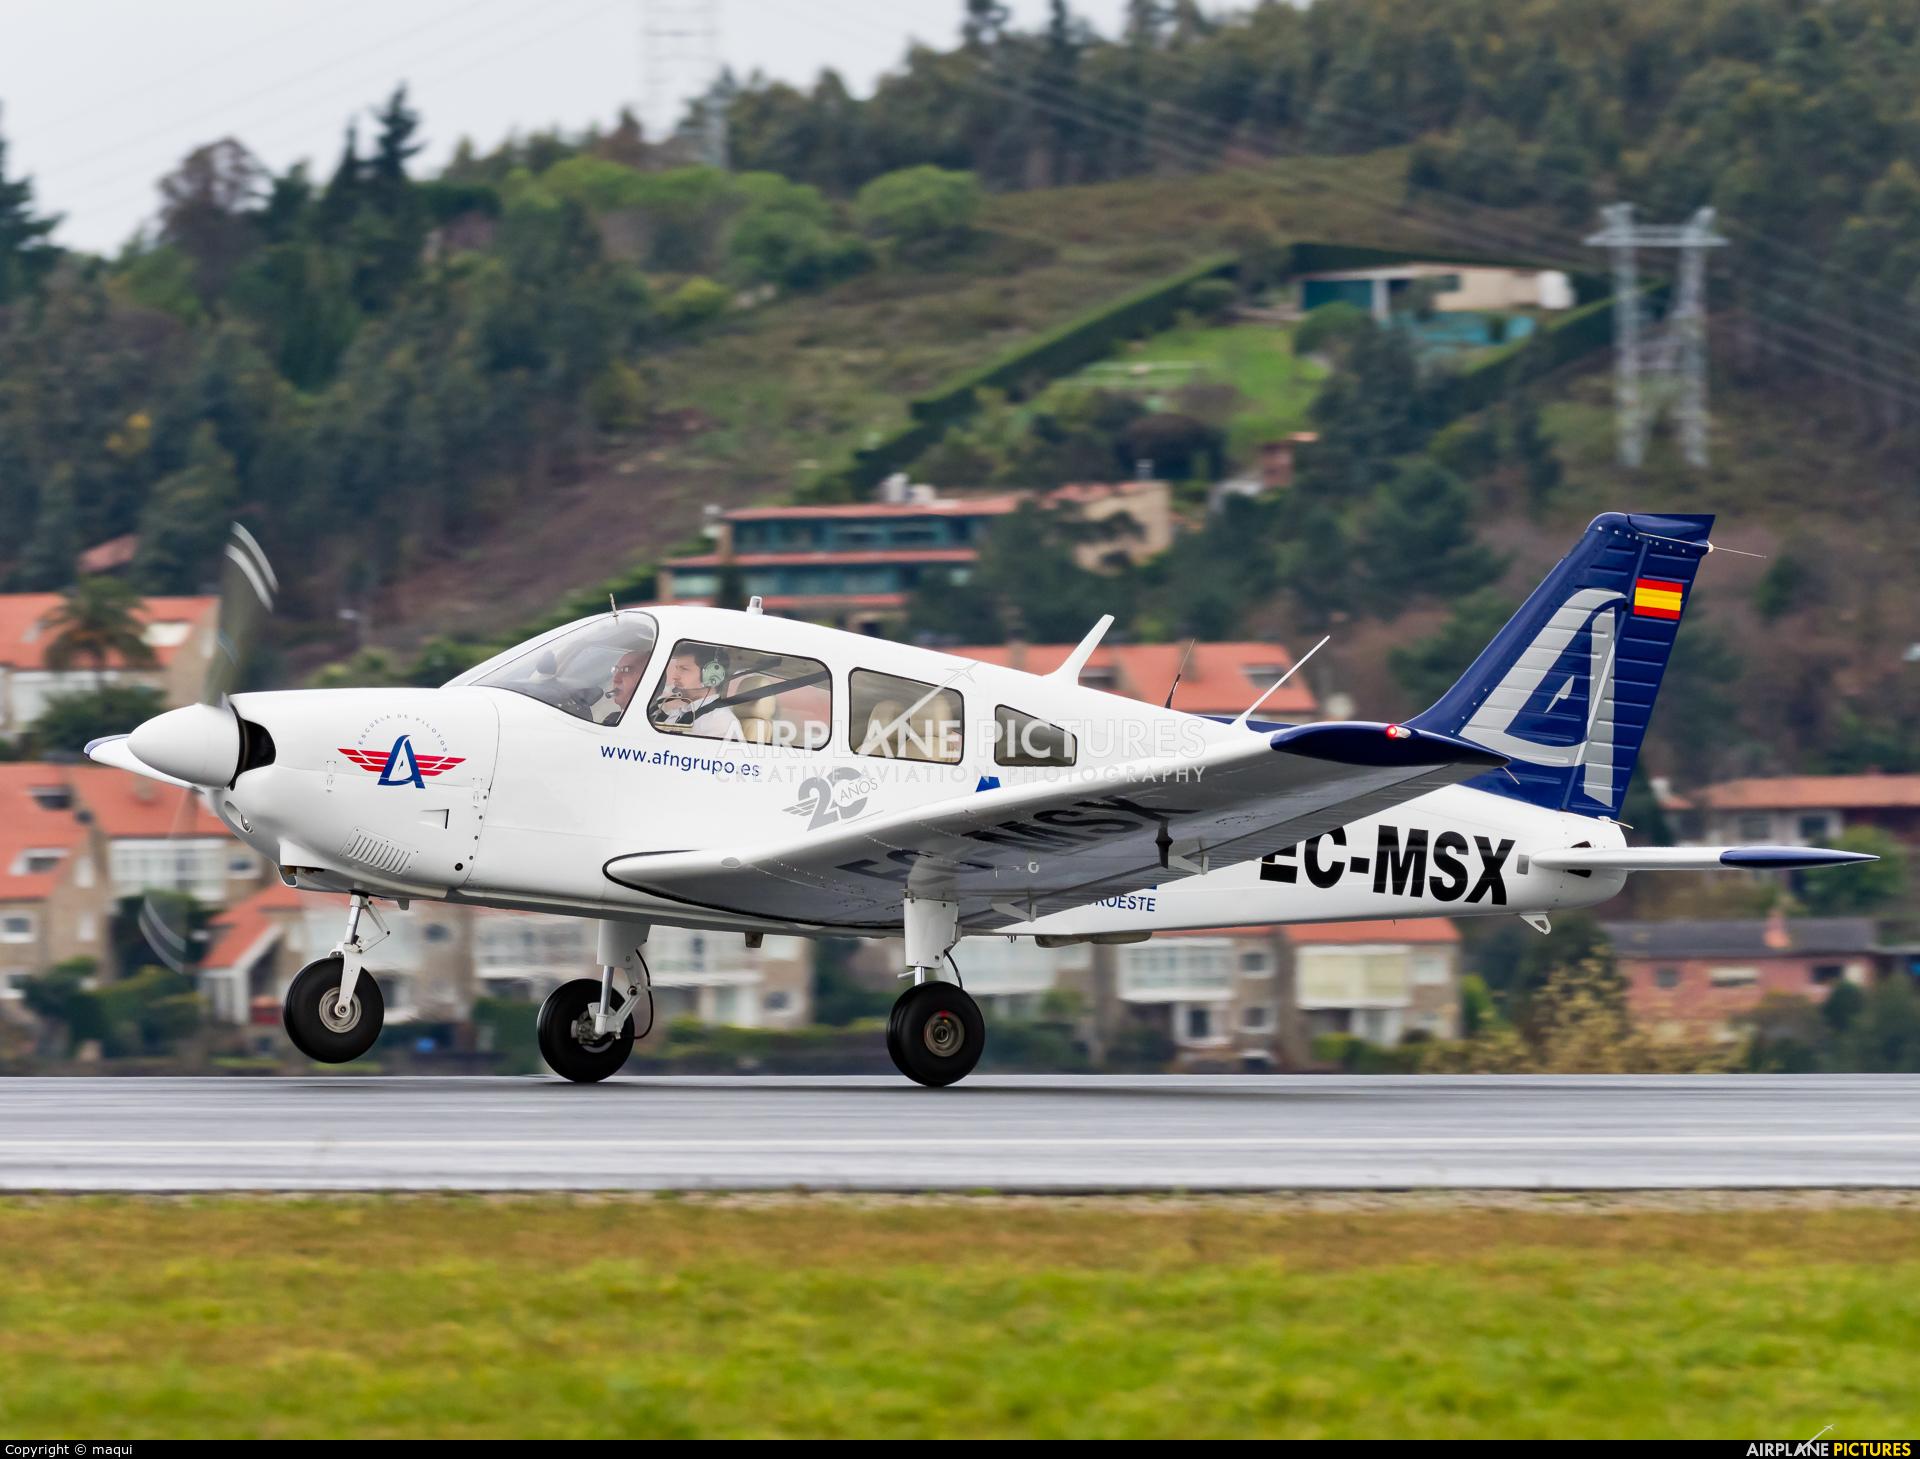 Aeroflota del Noroeste EC-MSX aircraft at La Coruña